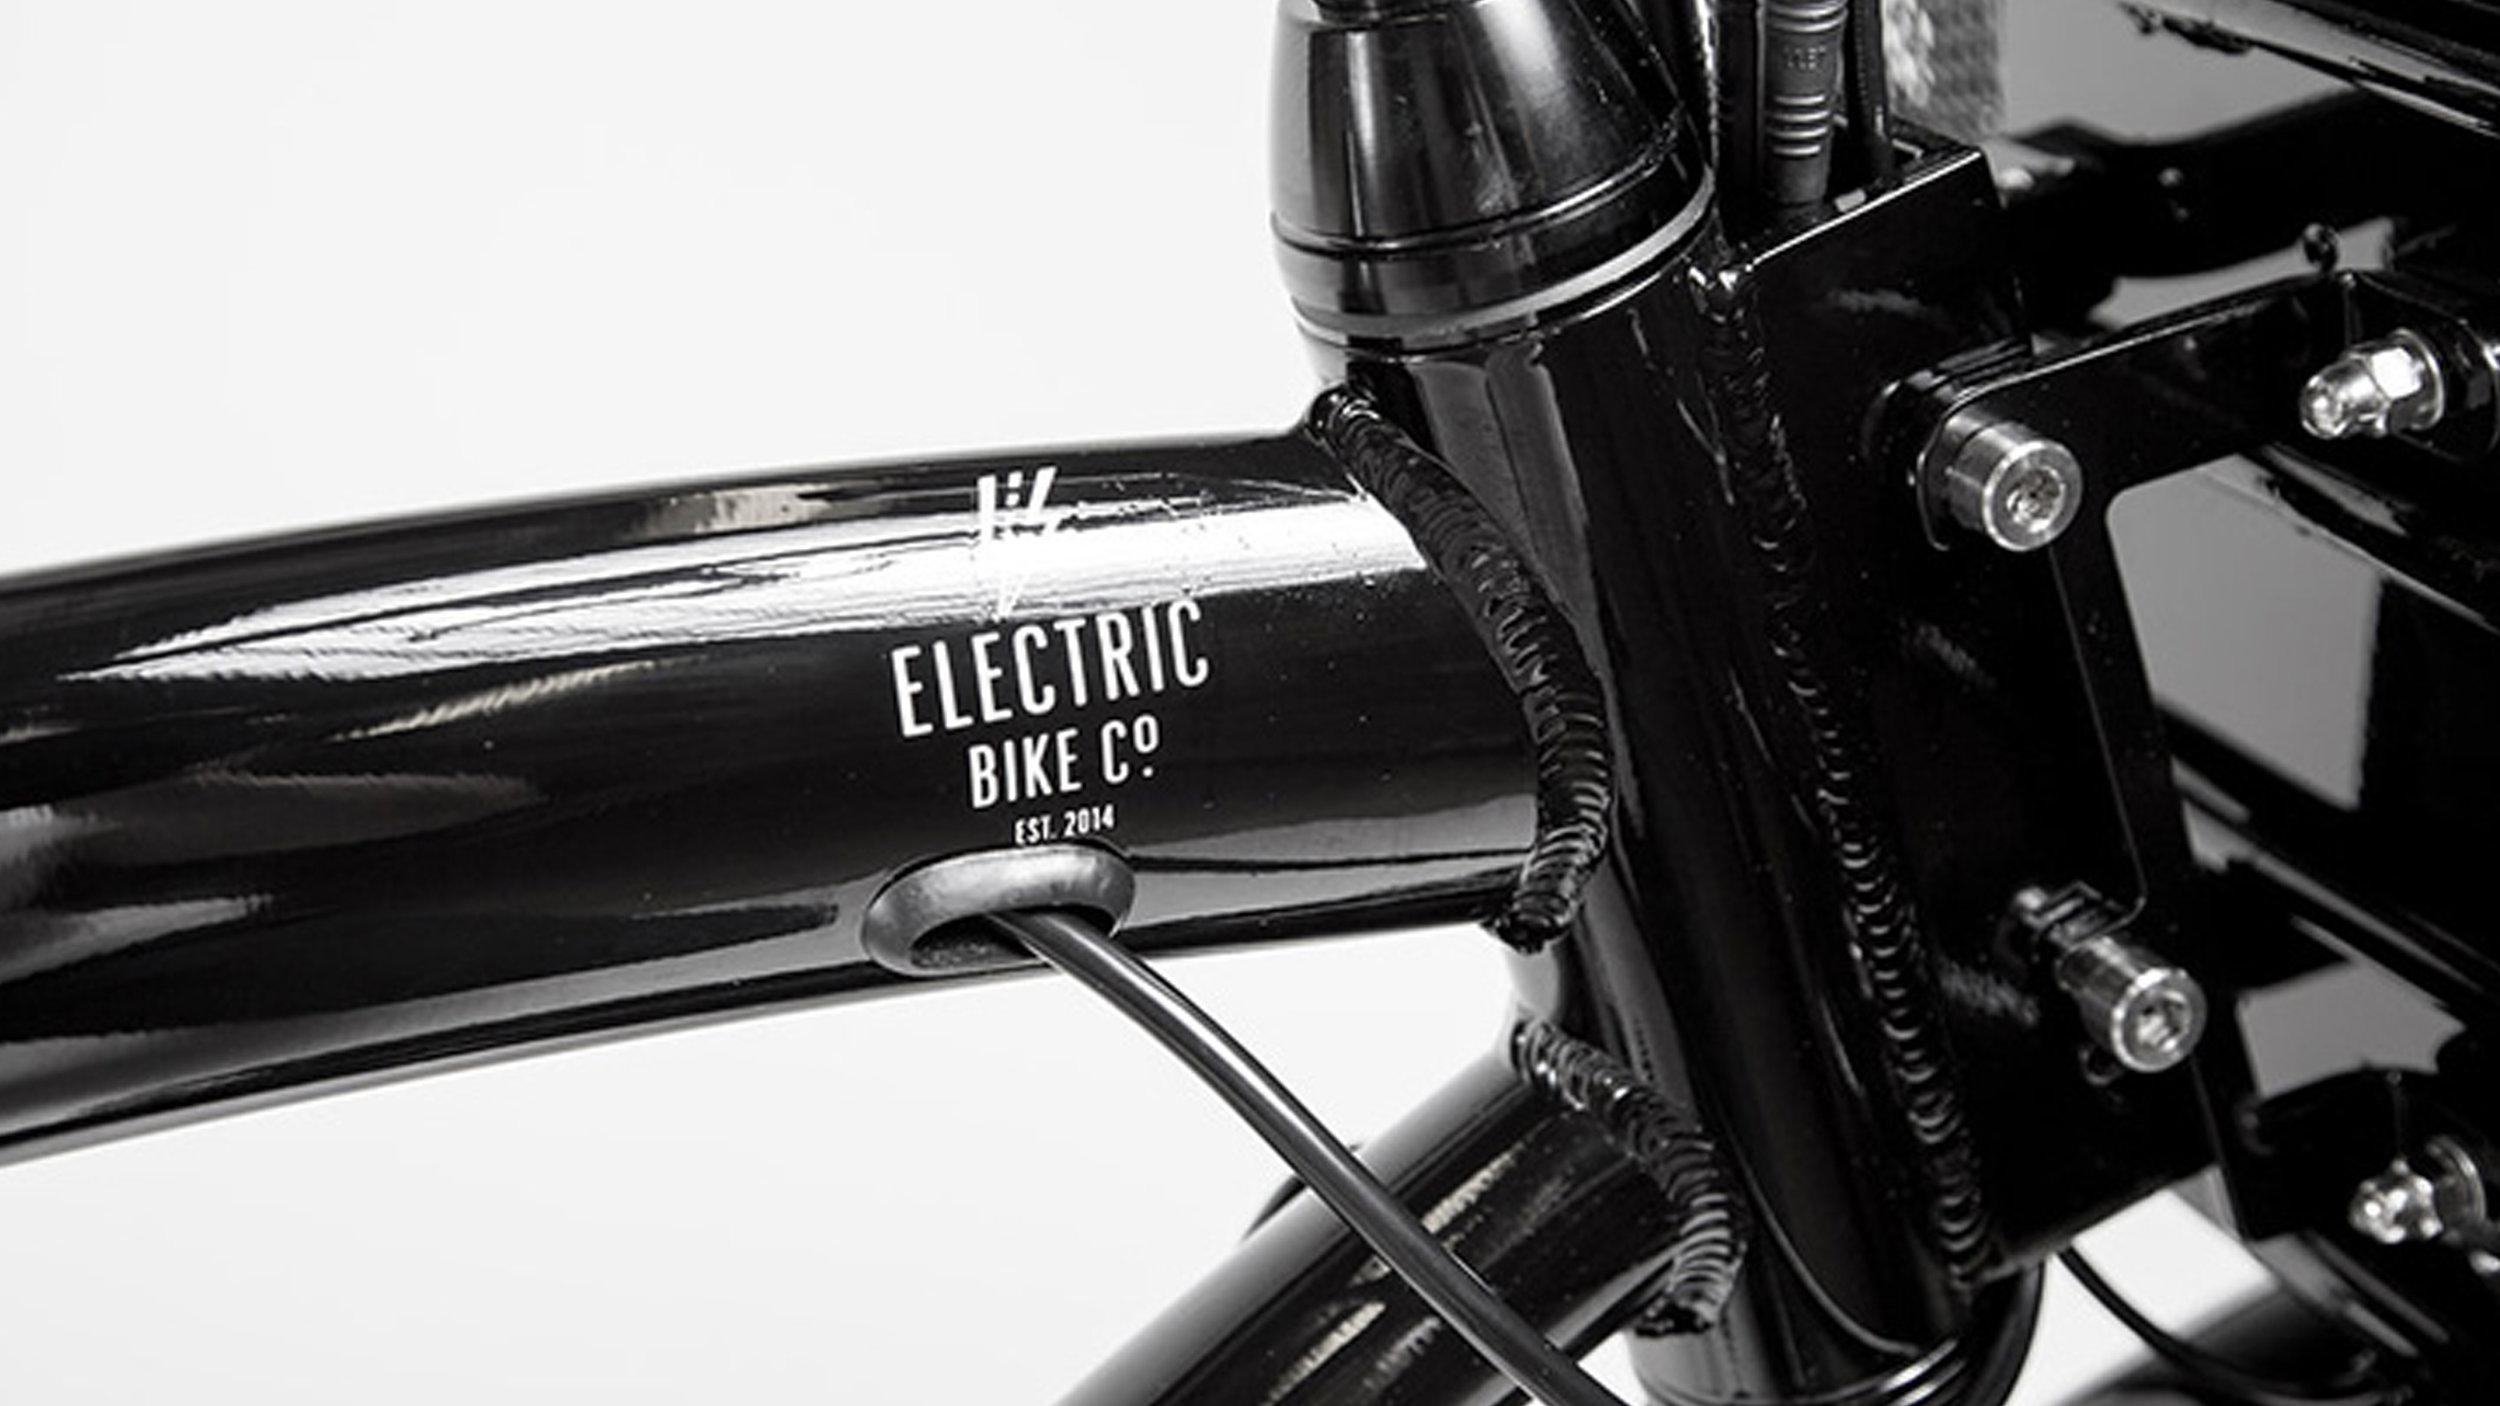 electrified-reviews-electric-bike-company-model-c-electric-bike-review-welds.jpg